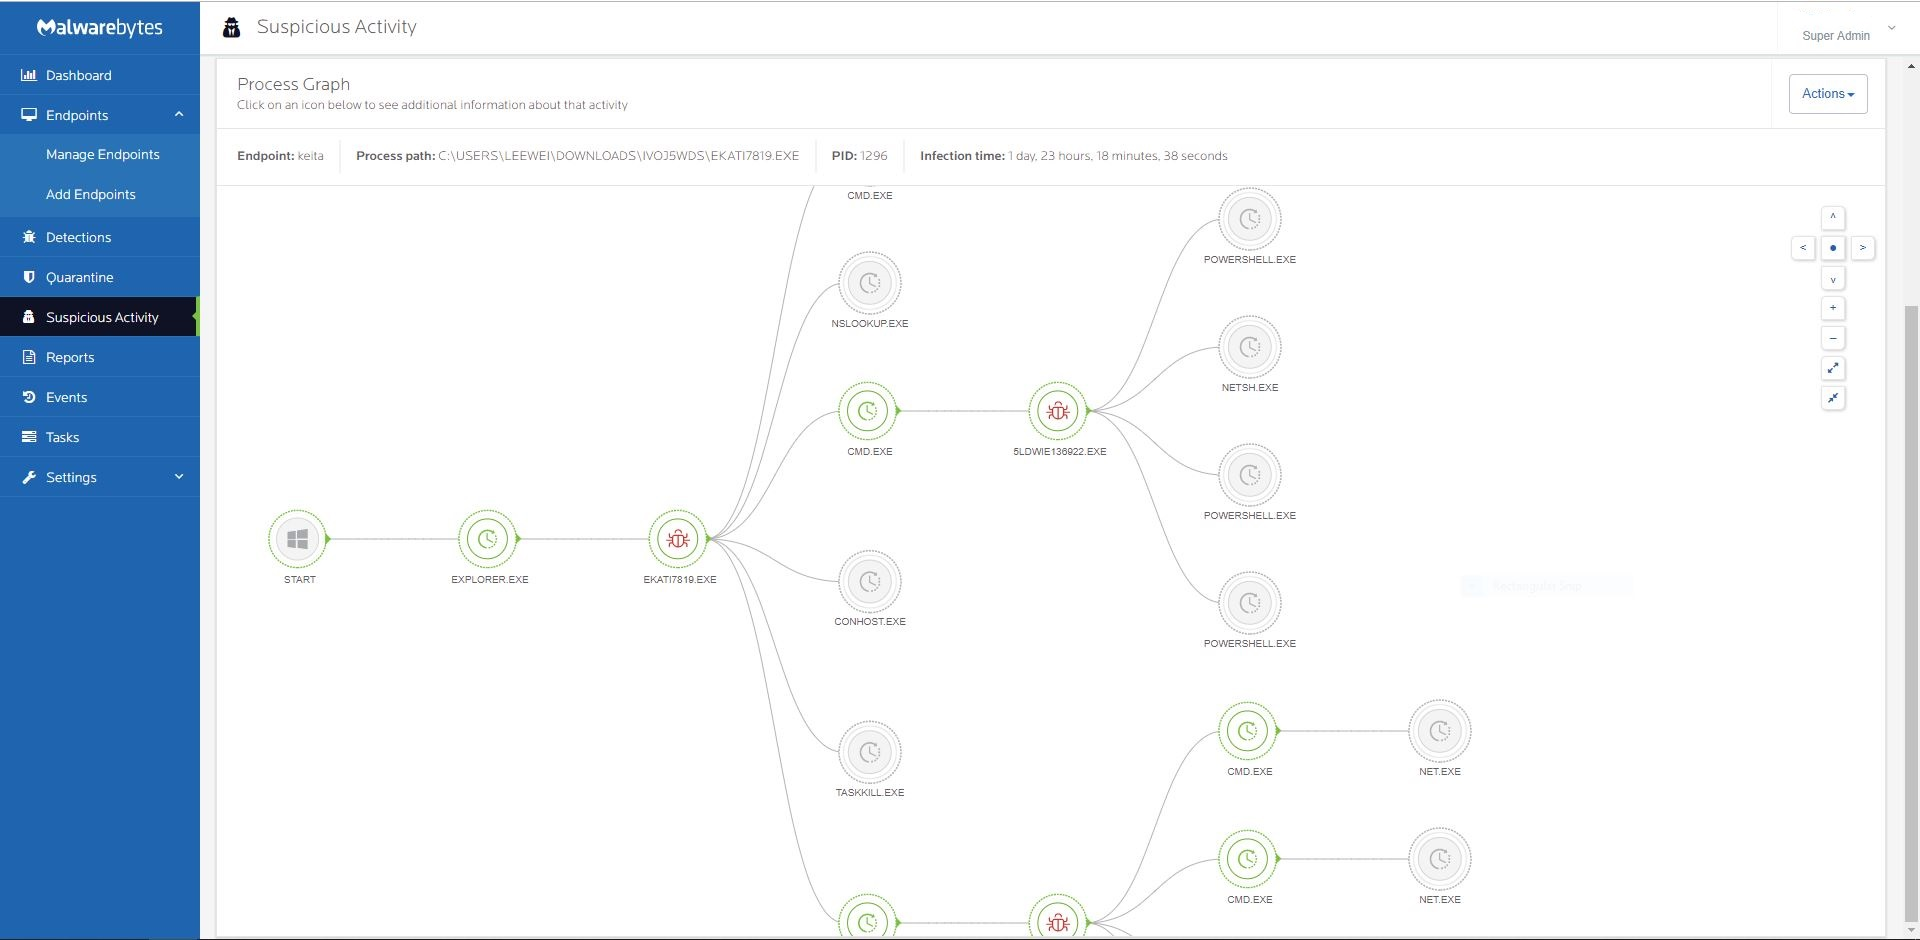 Process Graph